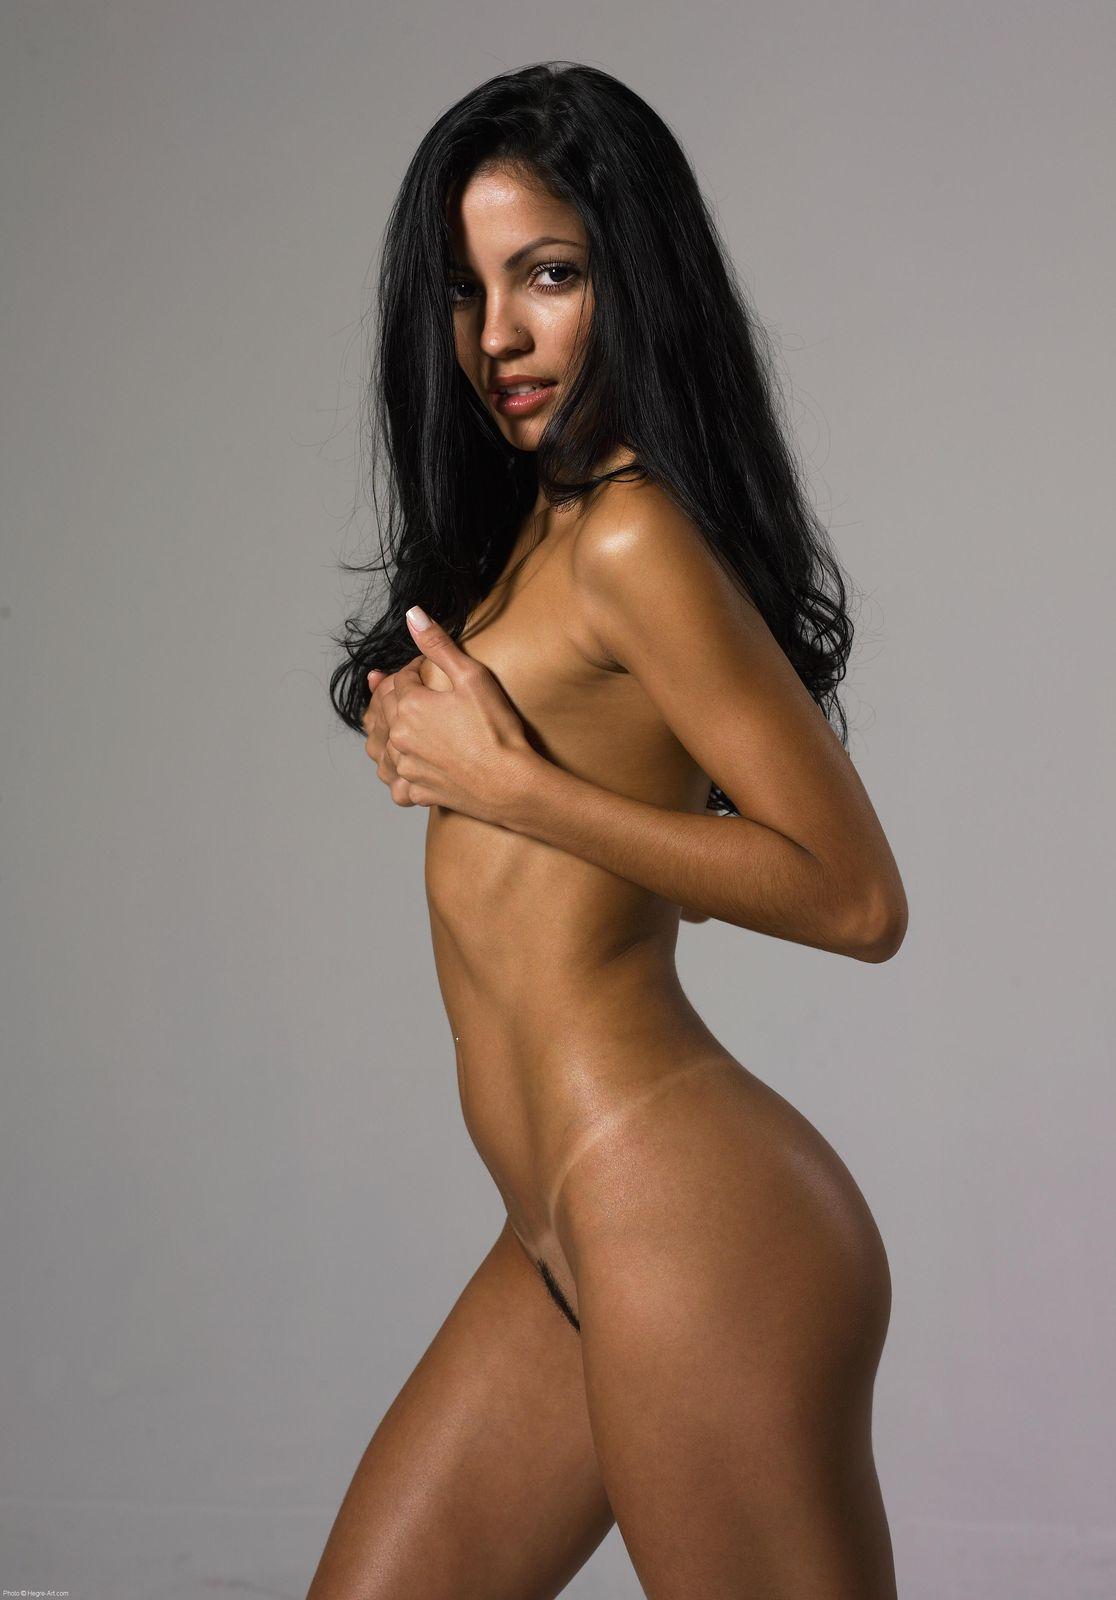 Sexy fitness girl nude pics